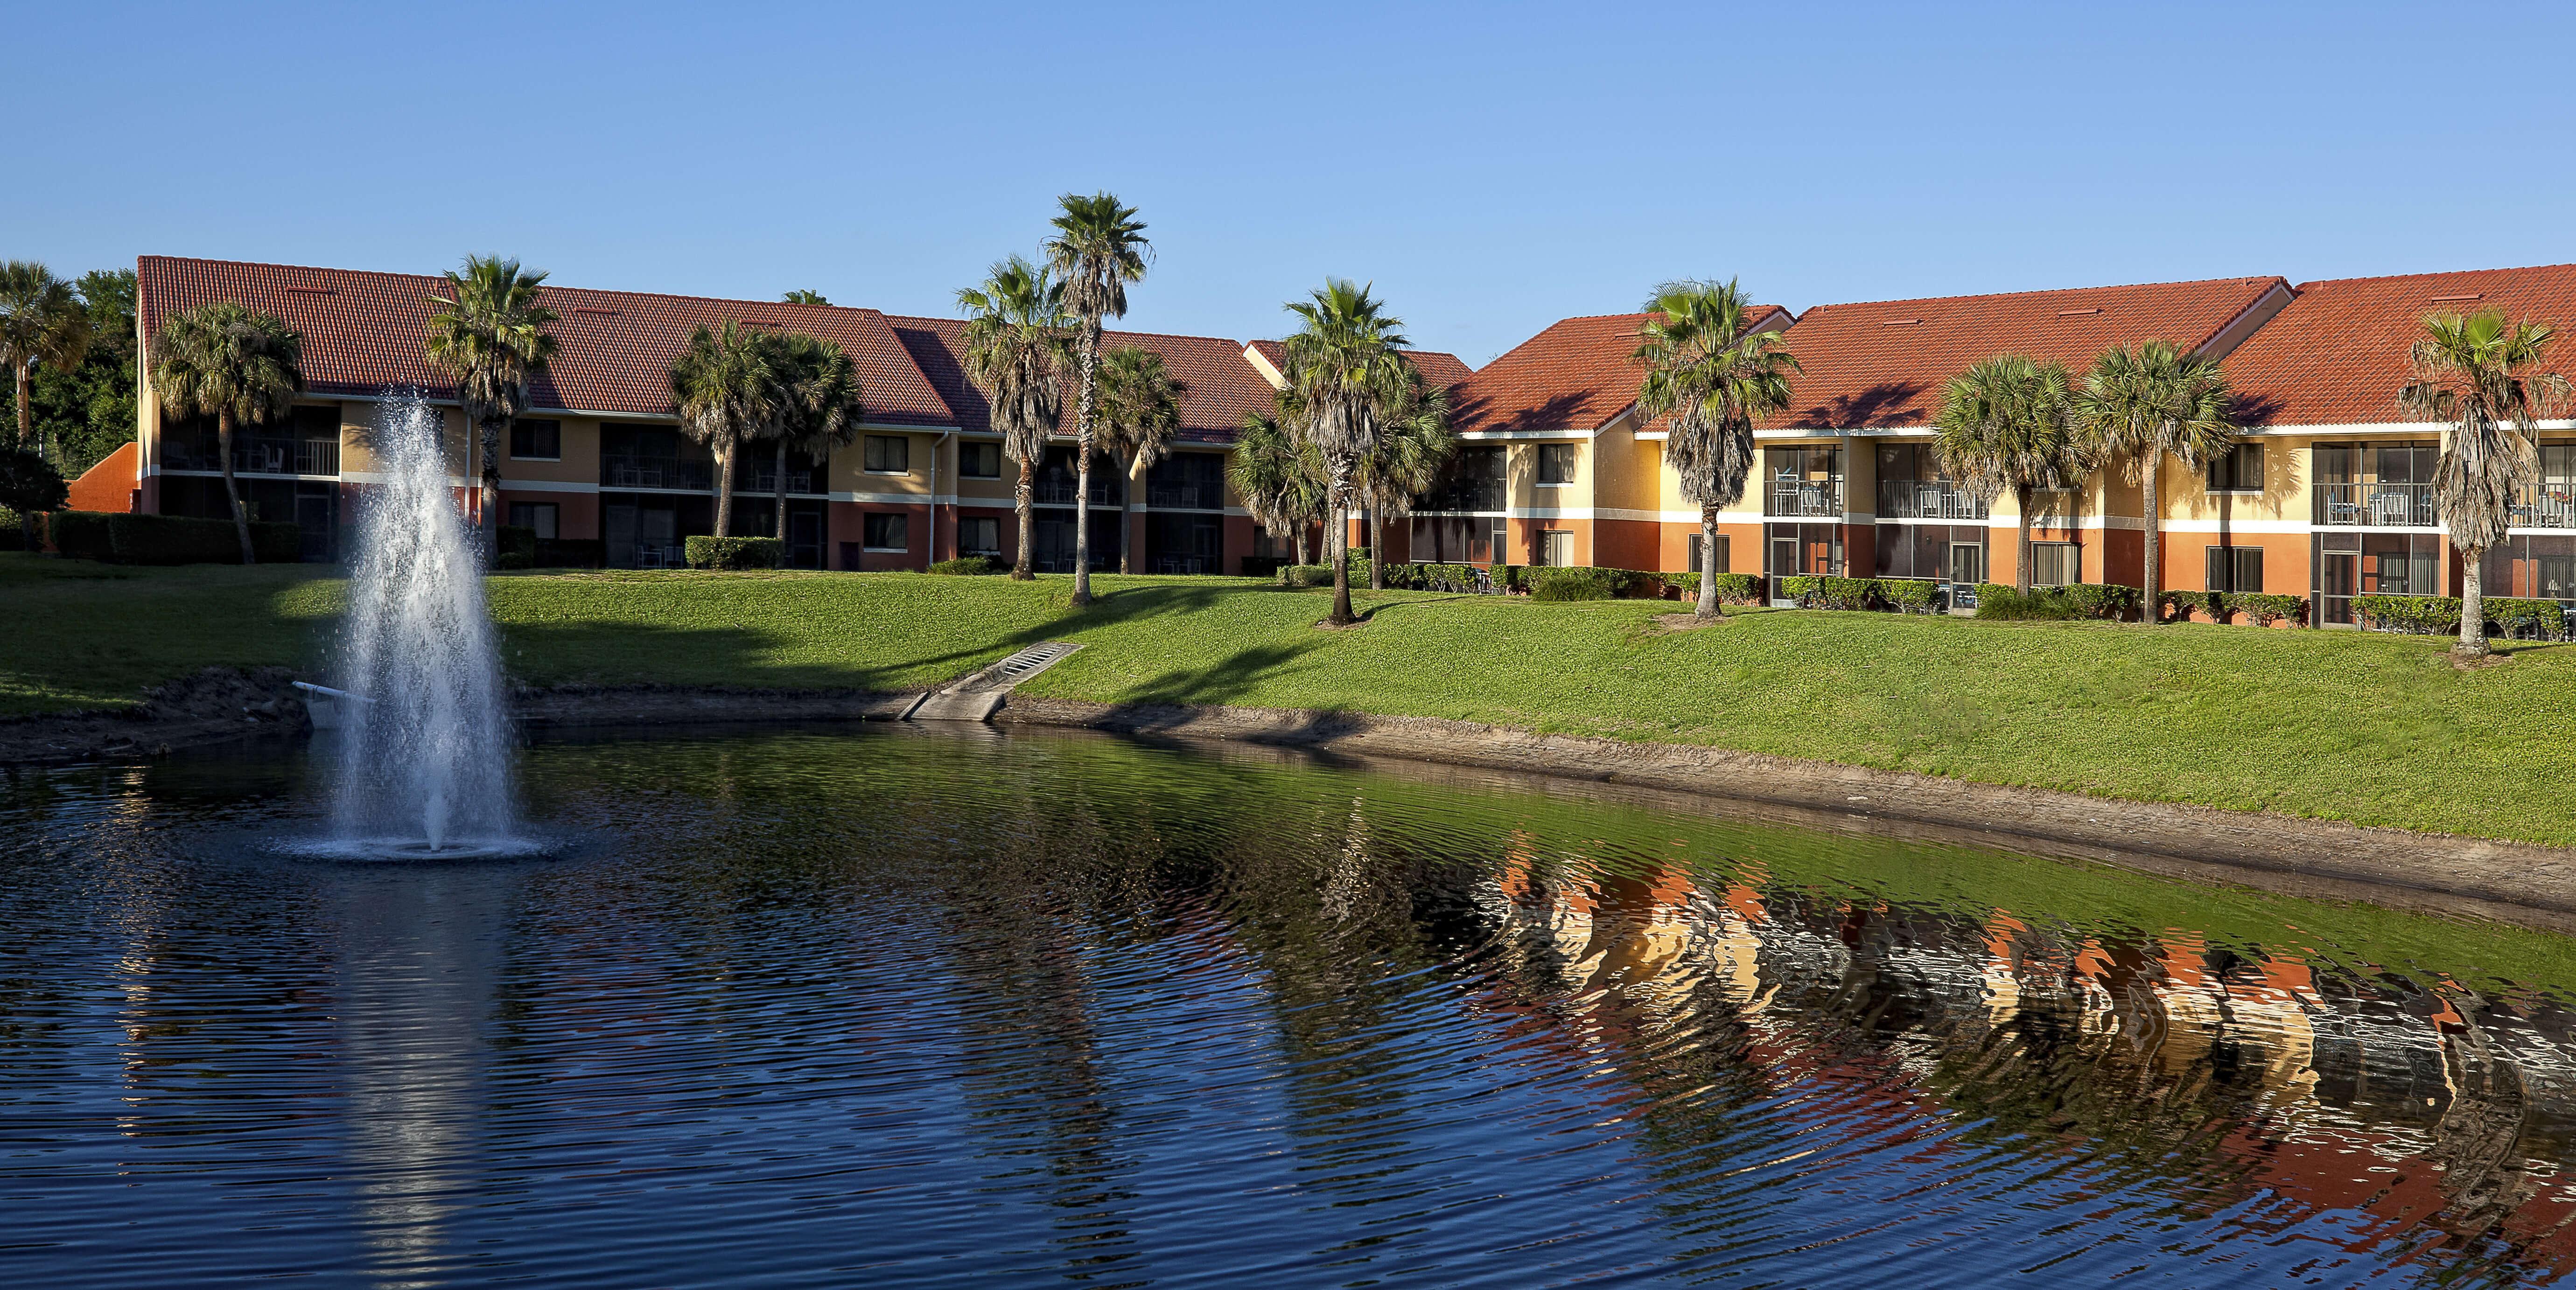 visit westgate vacation villas resort & spa